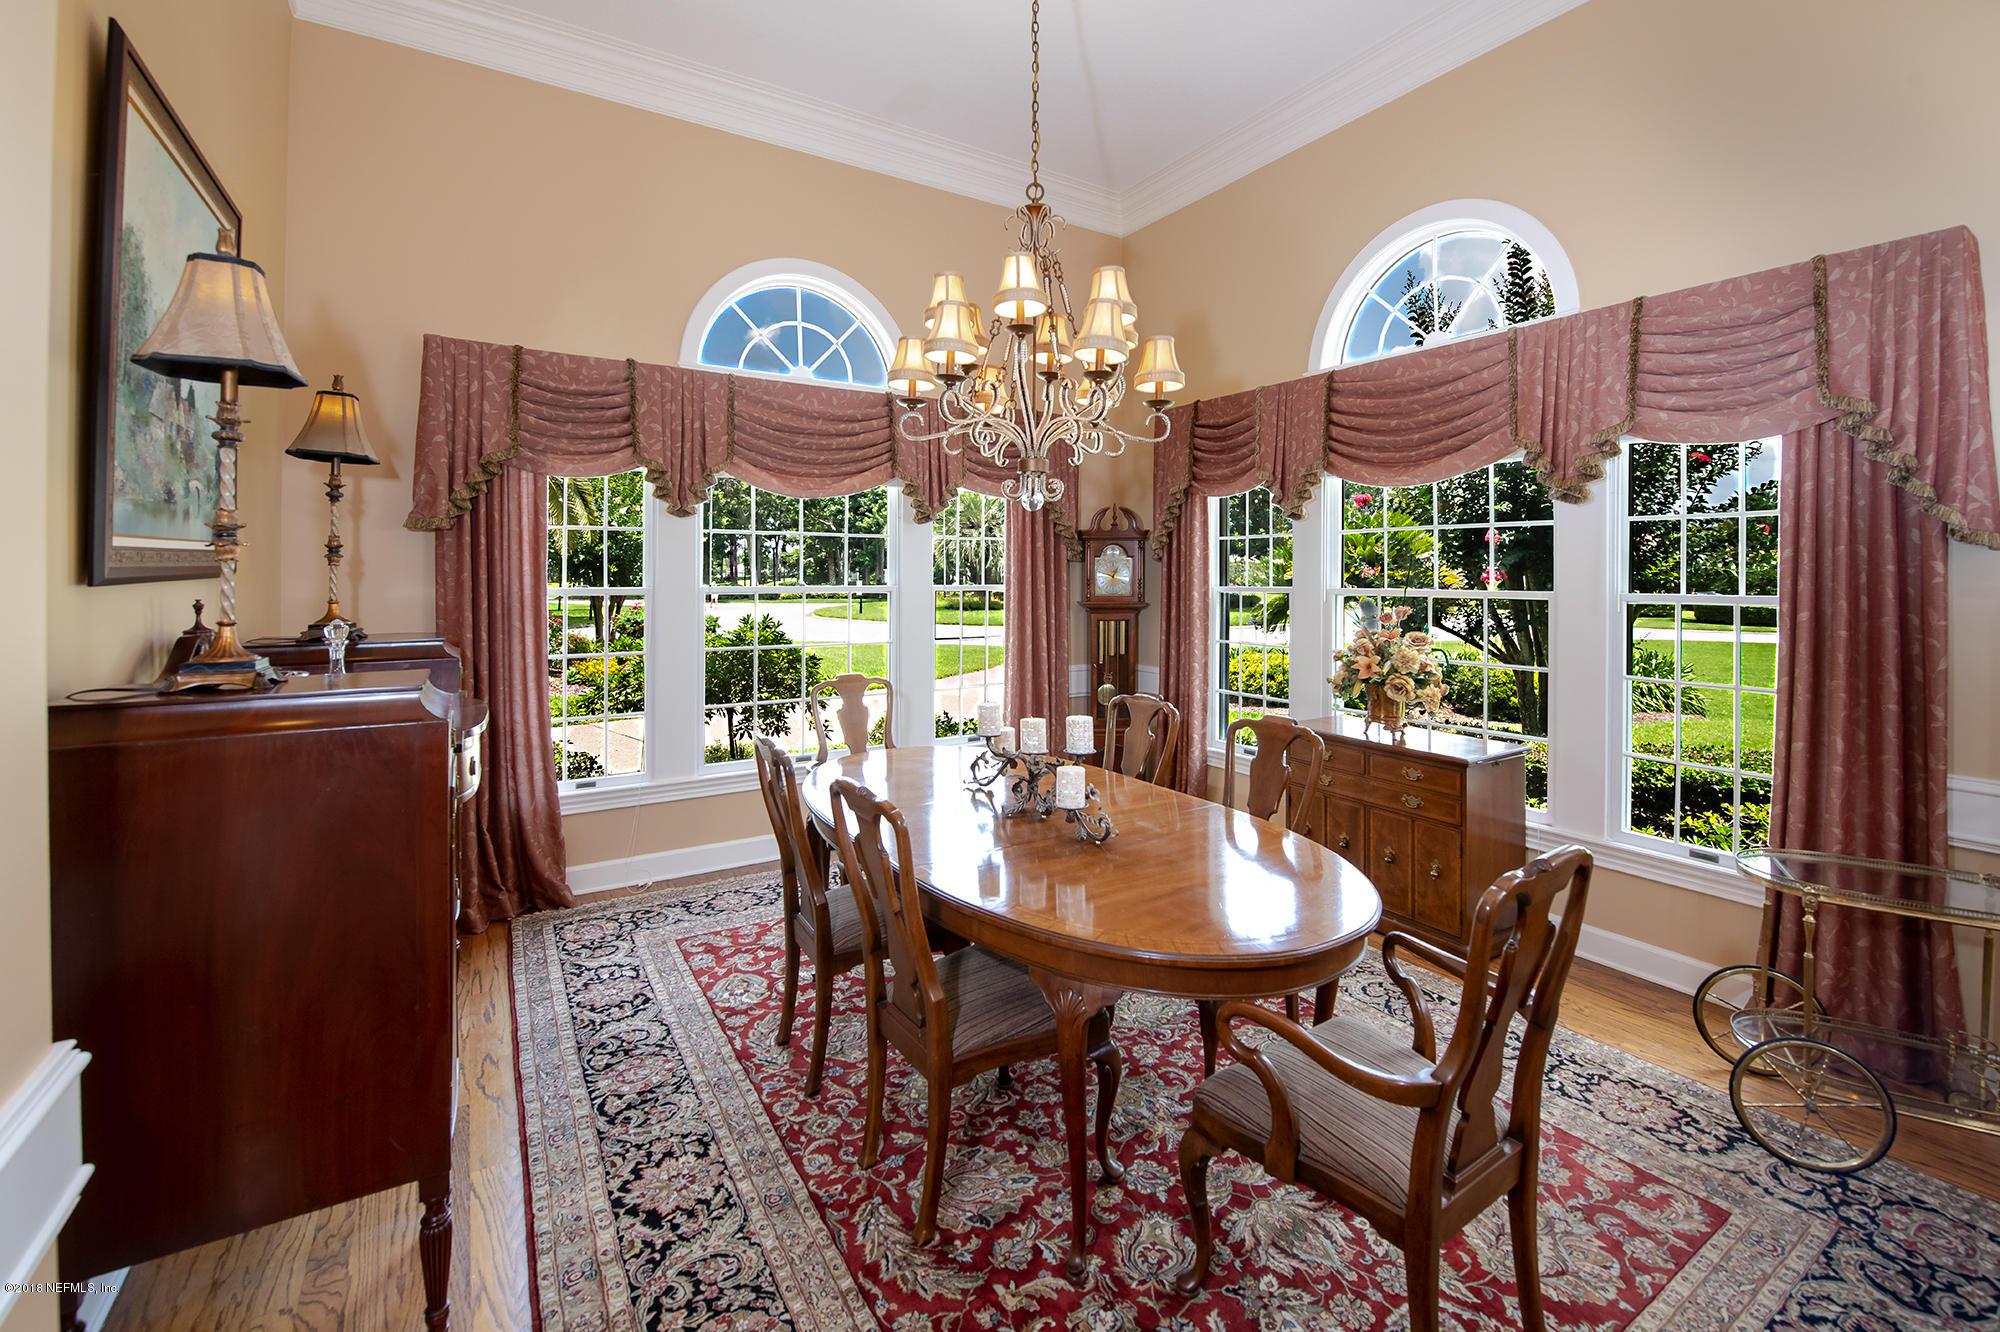 8039 WHISPER LAKE, PONTE VEDRA BEACH, FLORIDA 32082, 4 Bedrooms Bedrooms, ,3 BathroomsBathrooms,Residential - single family,For sale,WHISPER LAKE,944139